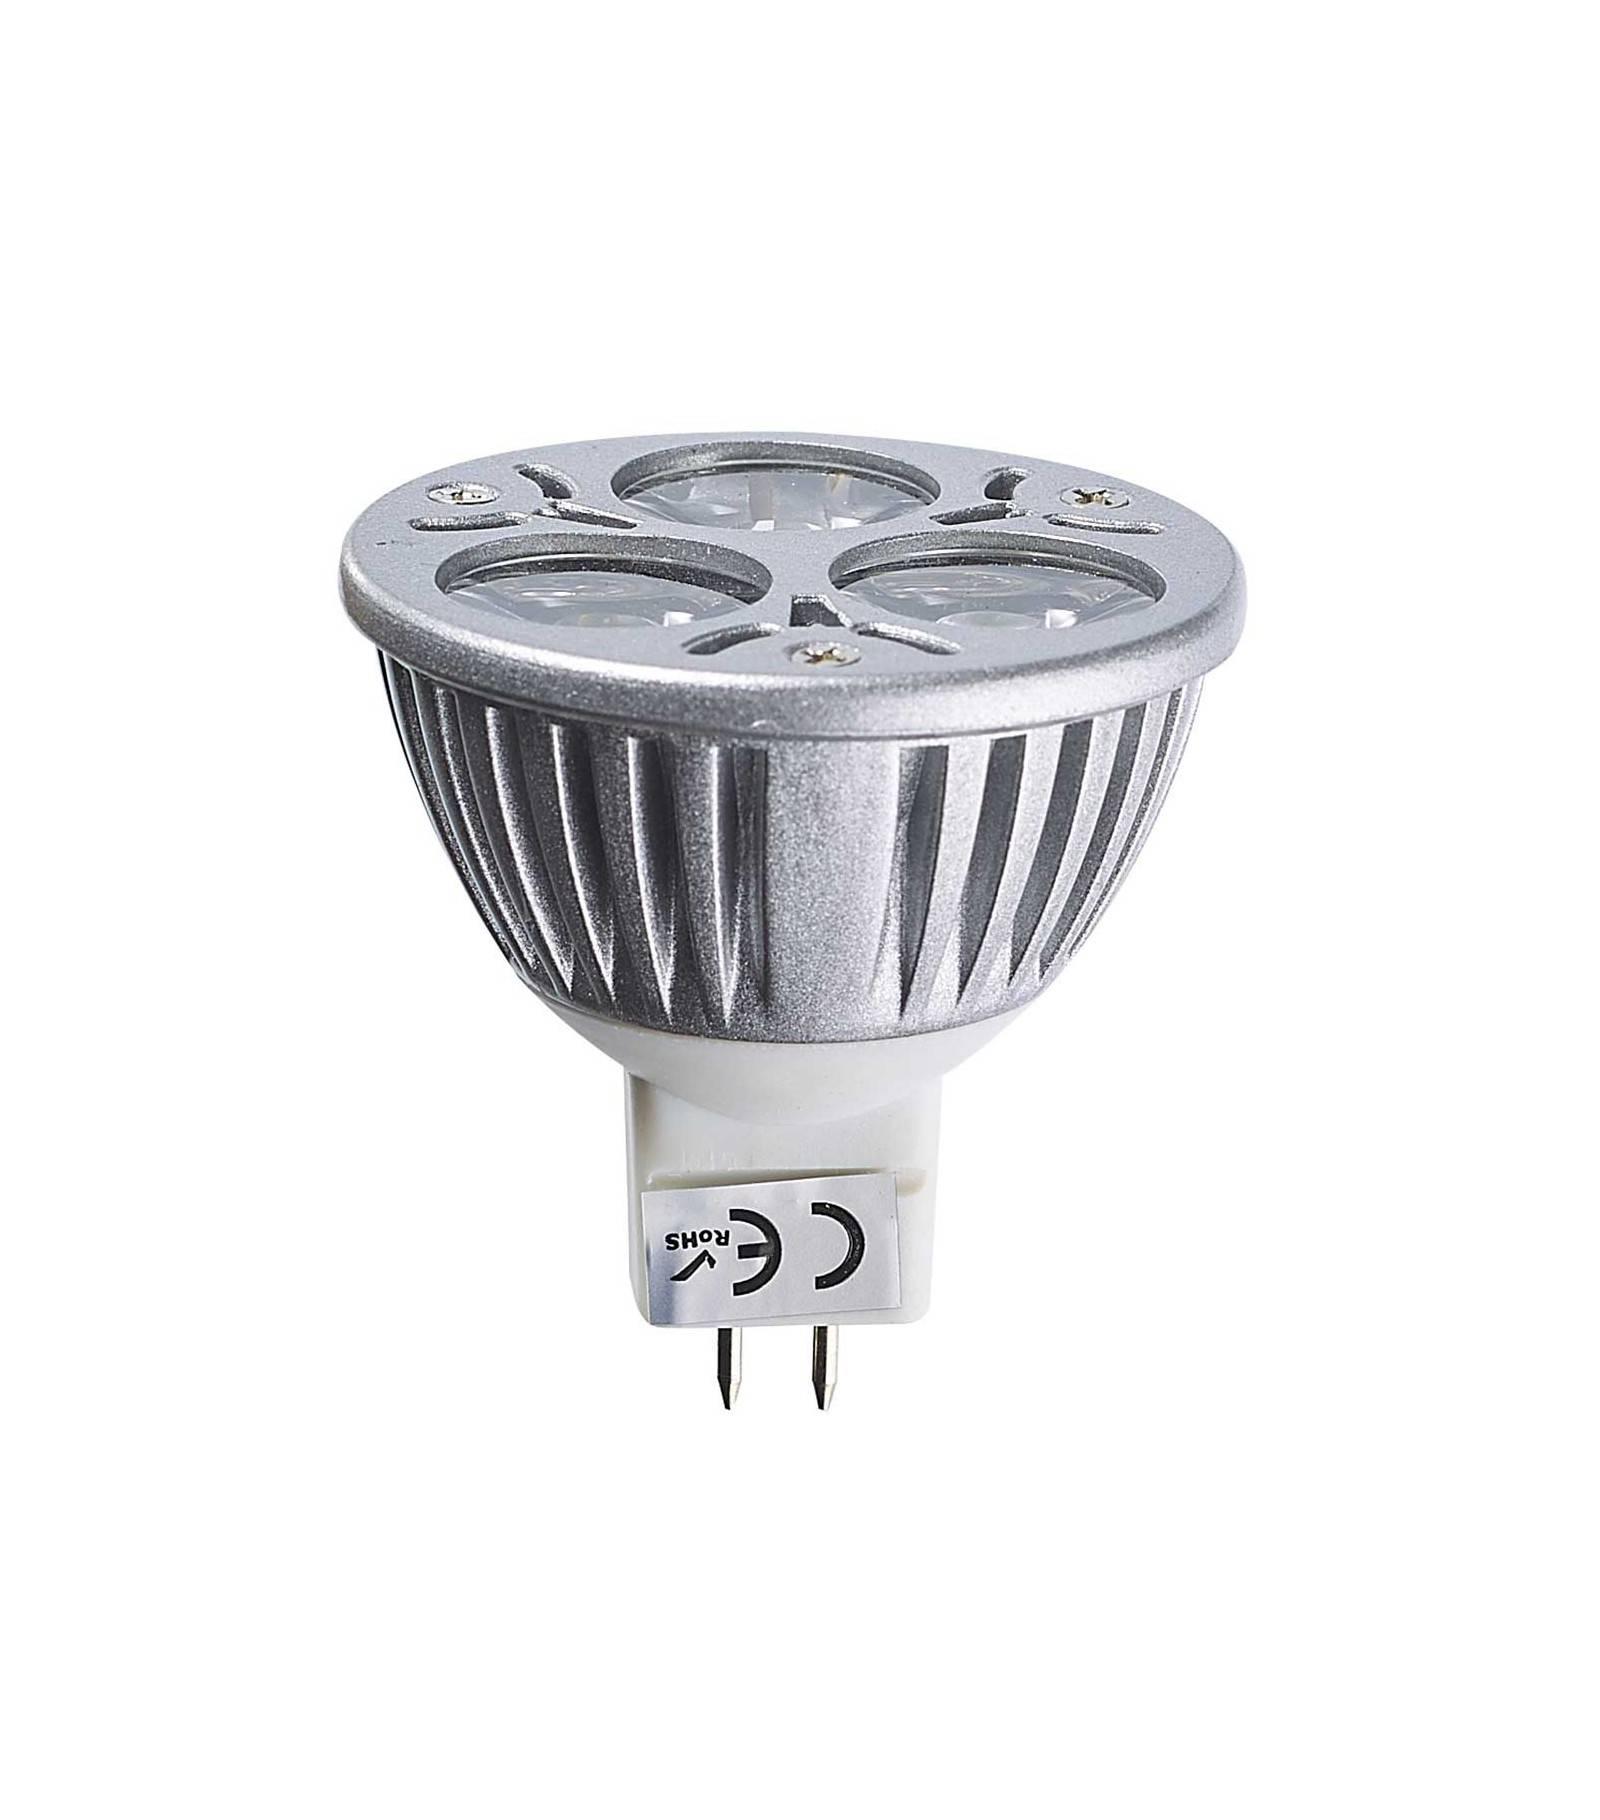 ampoule led gu5 3 mr16 triled 3x2w 6w 320 370lm blanc chaud 60 12v edison gu5 3 siageo. Black Bedroom Furniture Sets. Home Design Ideas